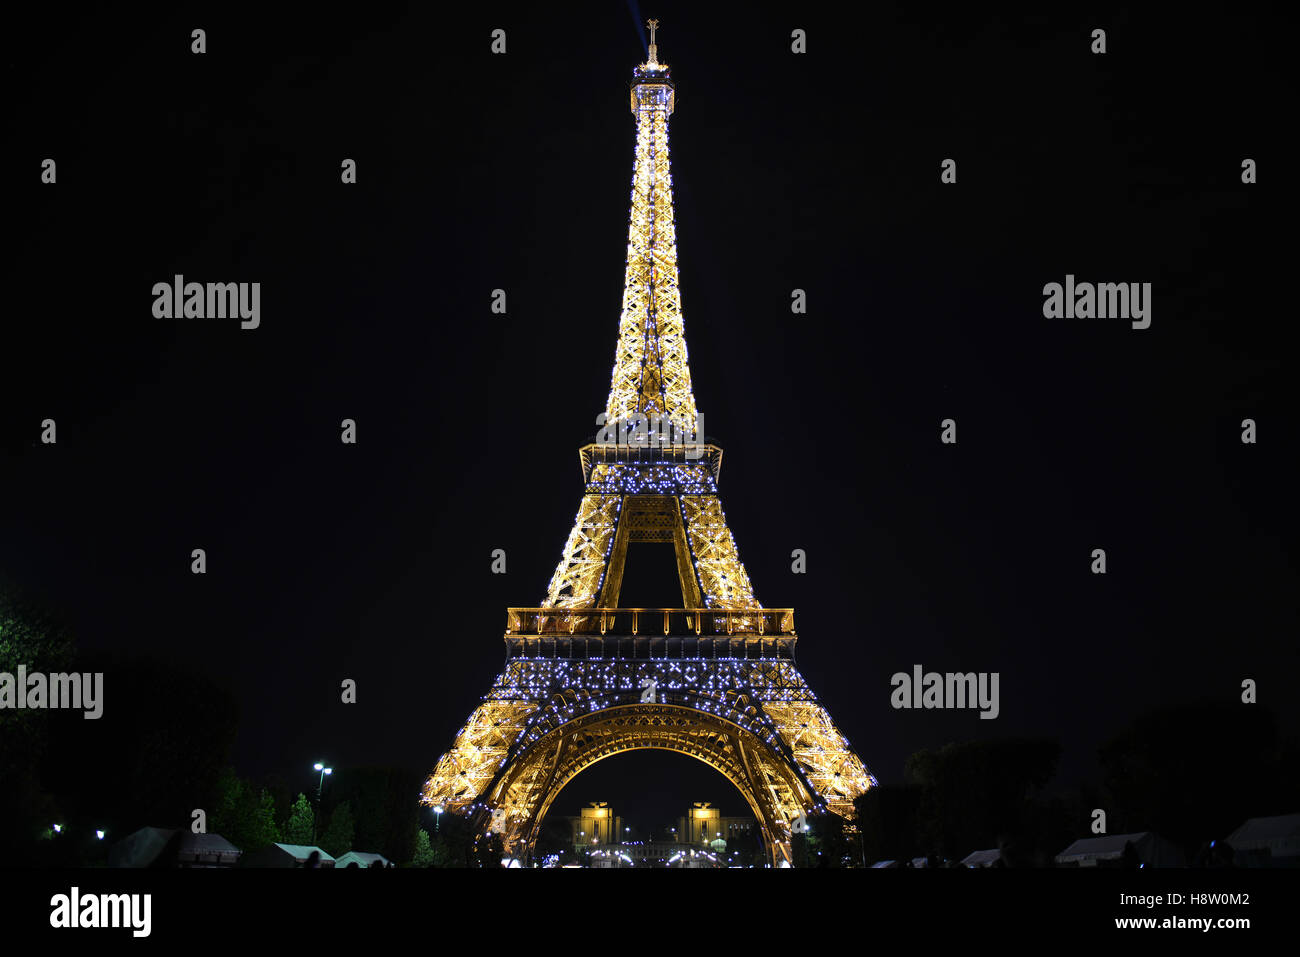 Eiffel Tower, Paris, France, Europe - At night lit up. - Stock Image